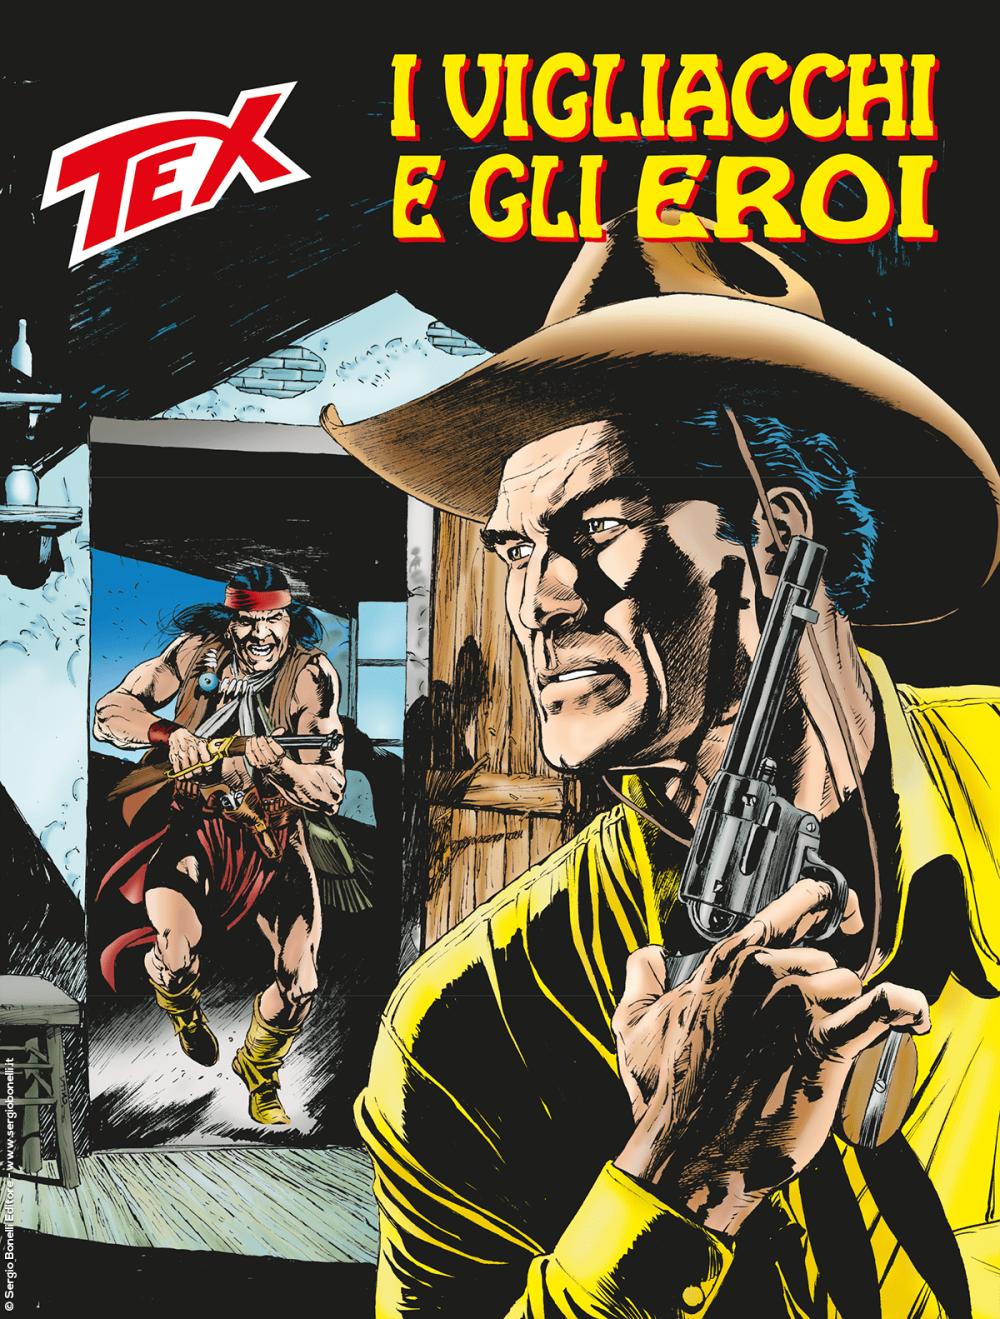 Tex. I vigliacchi e gli eroi